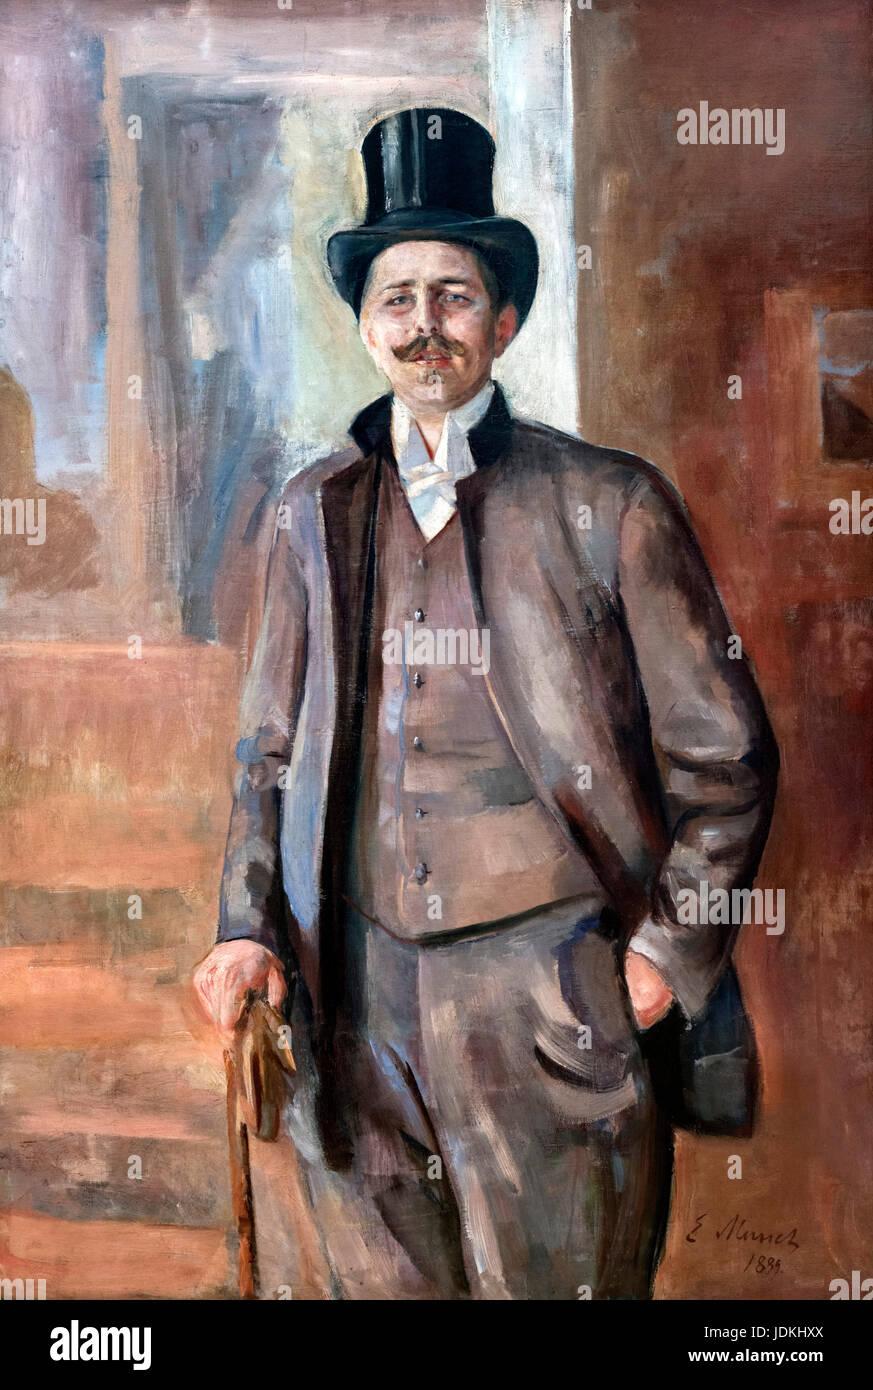 Portrait of the Artist Carl Johannes Andreas Adam Dørnberger by Edvard Munch (1863-1944), 1889 - Stock Image